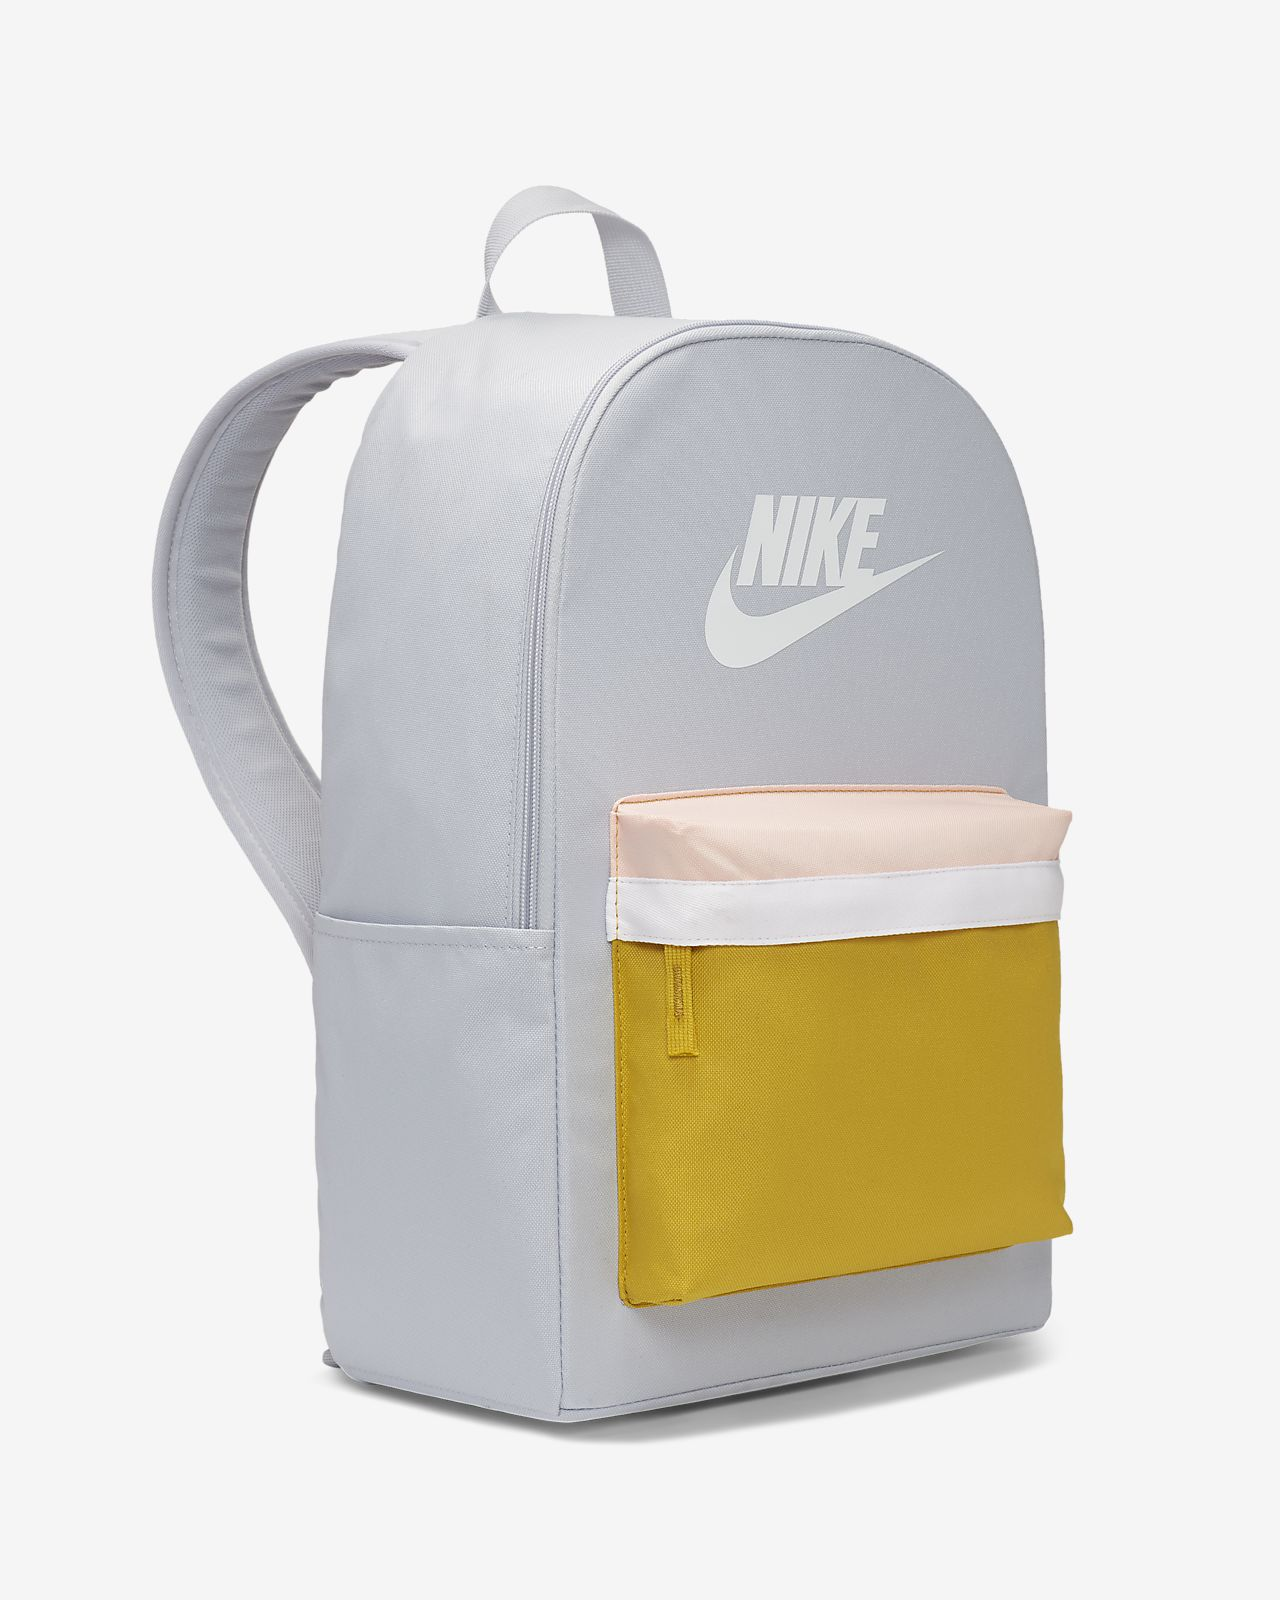 Mochila Nike Heritage 2.0 Preto e Dourado